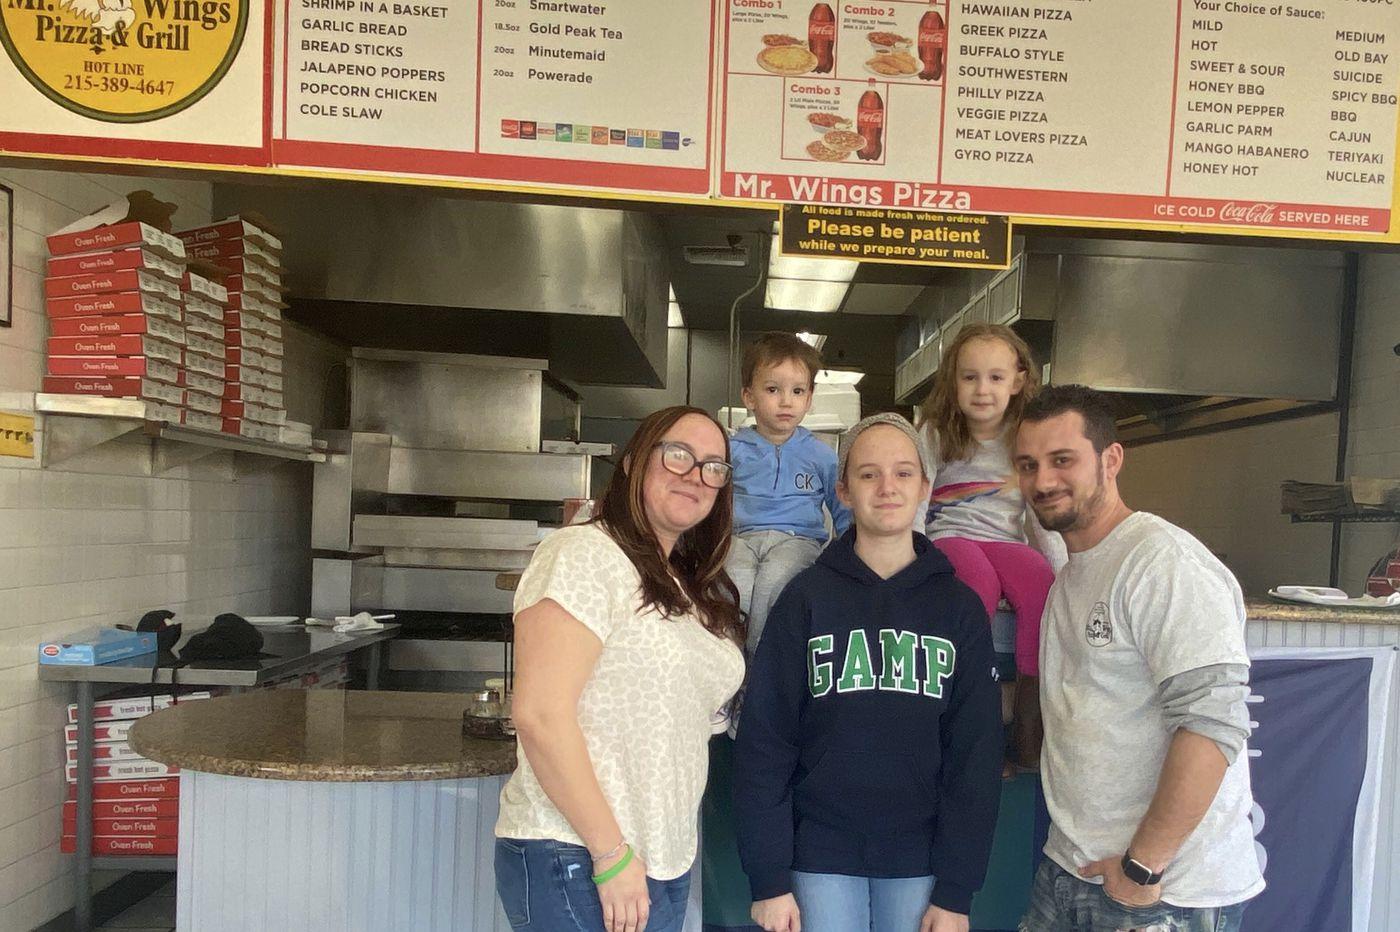 Parent Trip: Rebecca Wall and Jerry Karalis of South Philadelphia